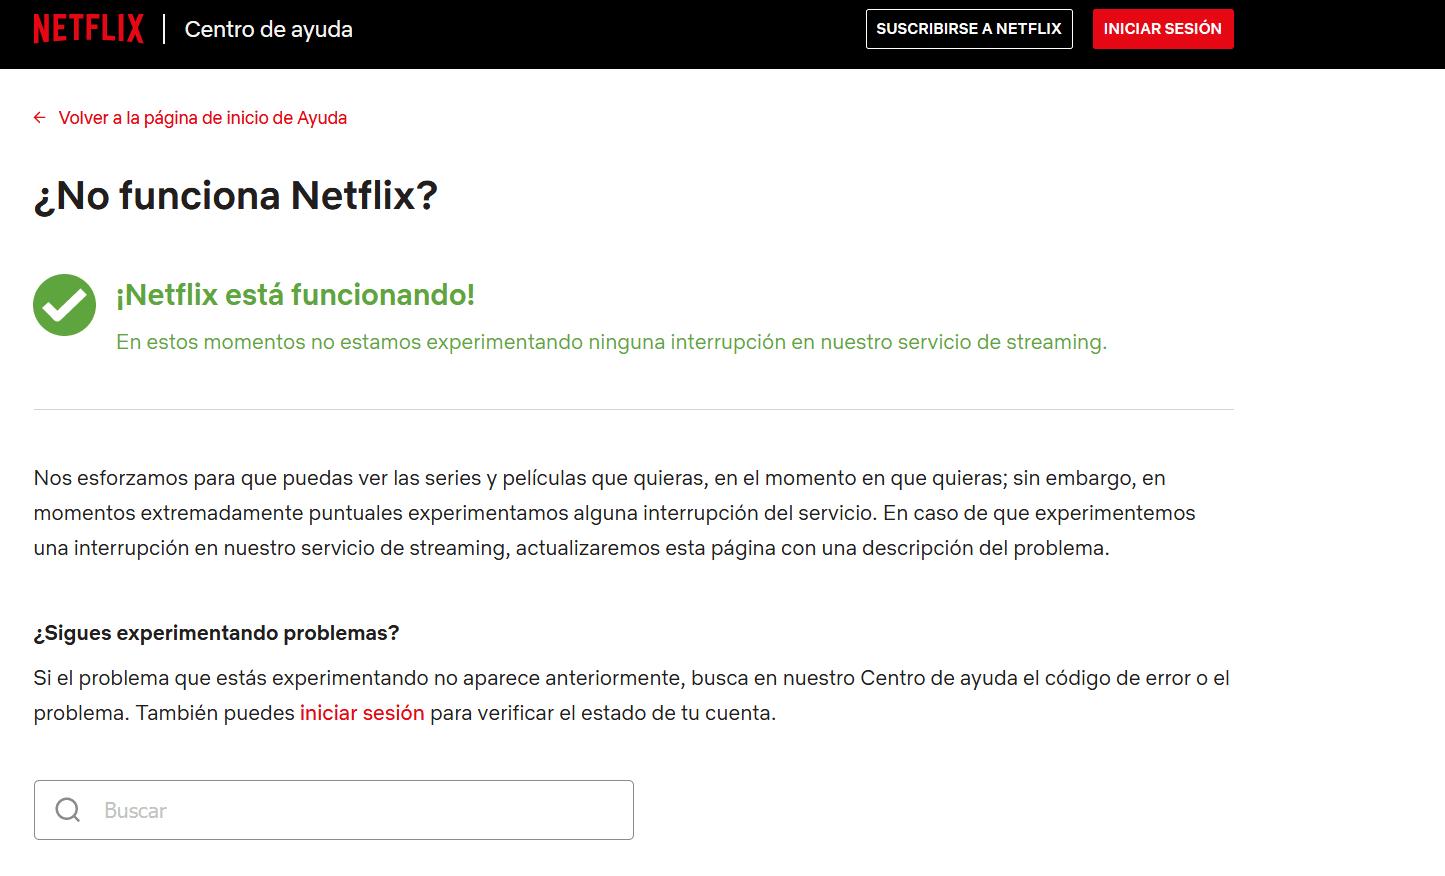 Centro de ayuda de Netflix